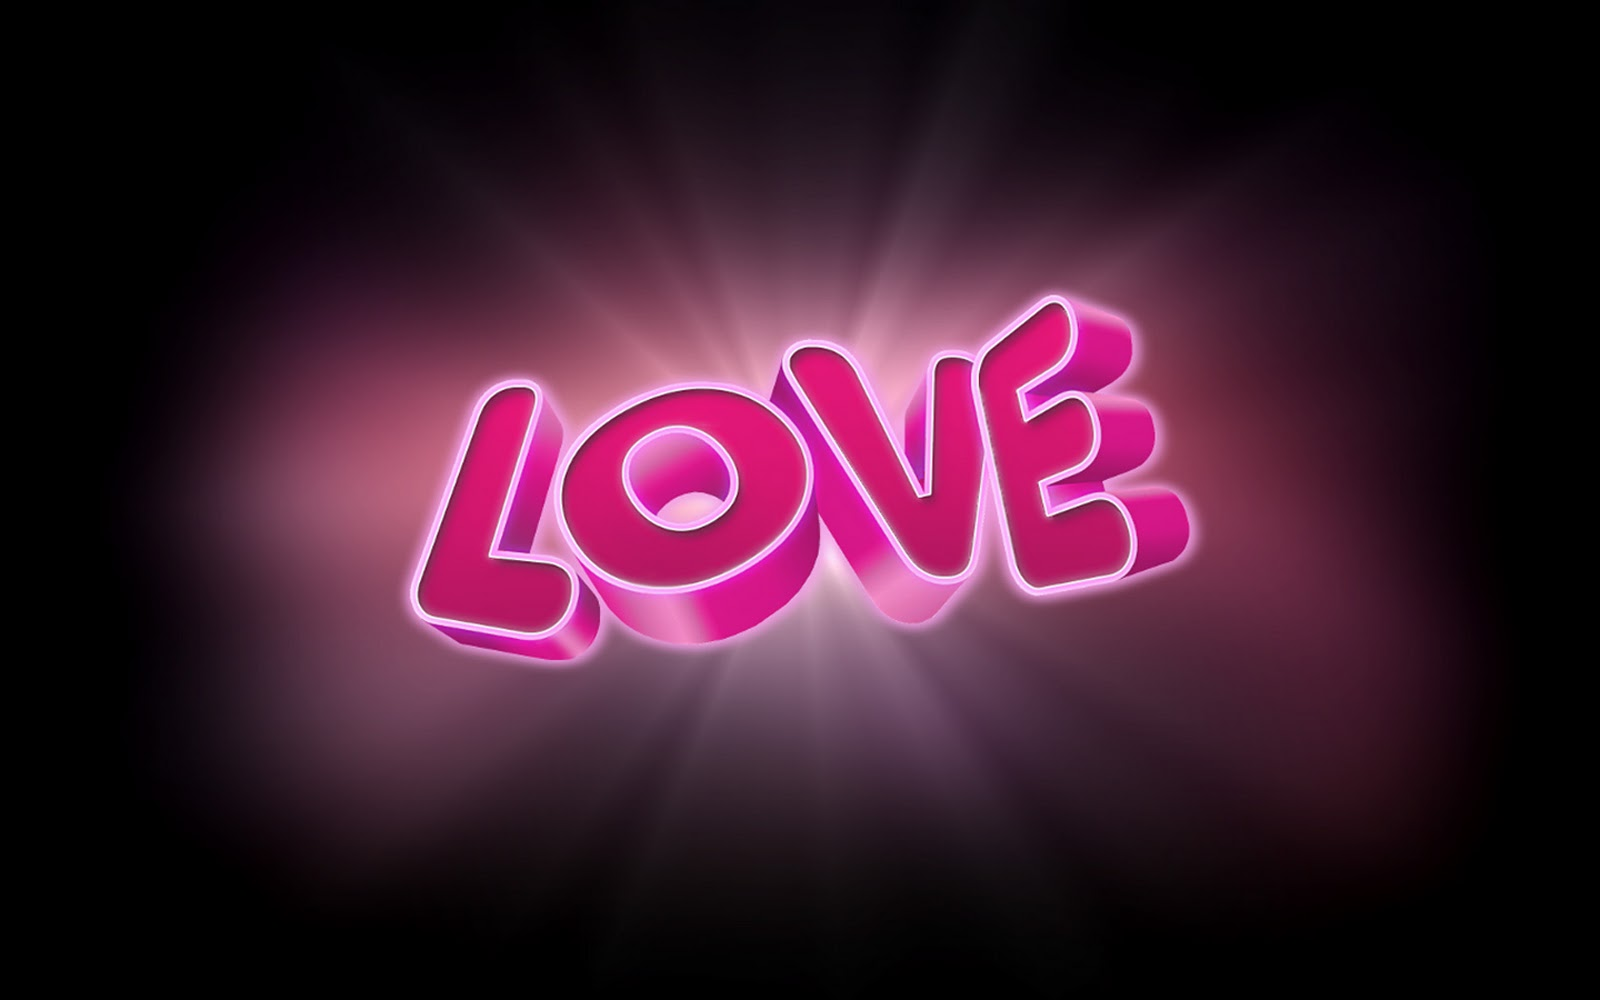 Beautiful Wallpapers for Desktop: Love HD Wallpapers